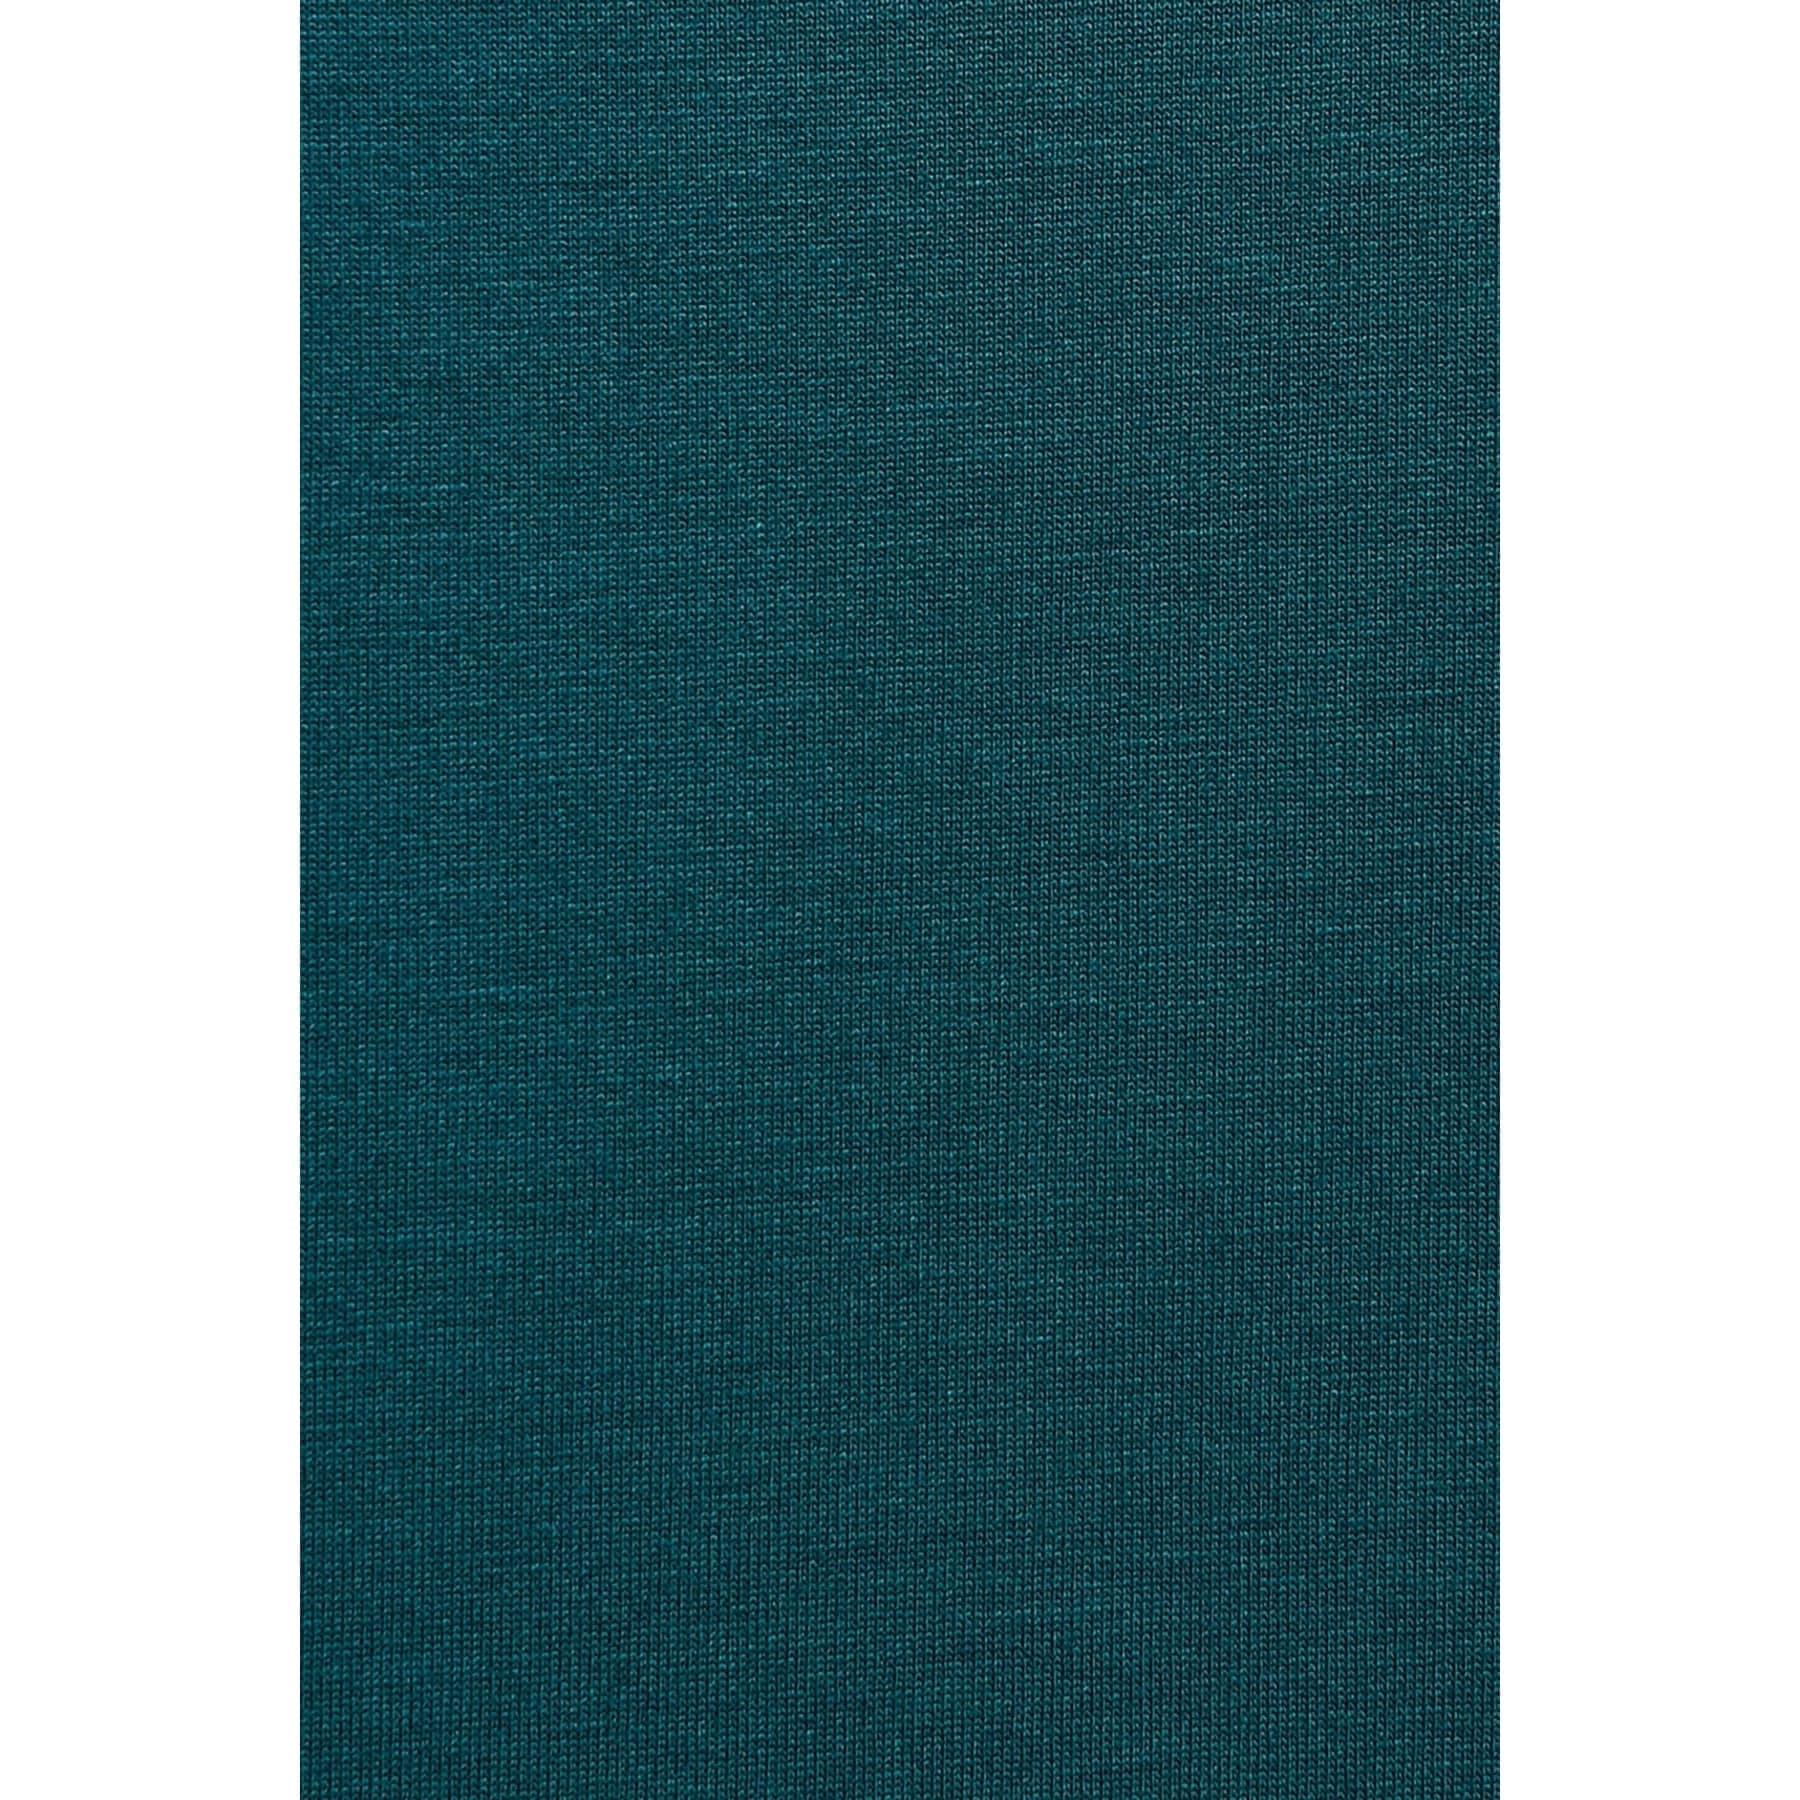 Mavi V Yaka Kadın Çam Yeşili Tişört